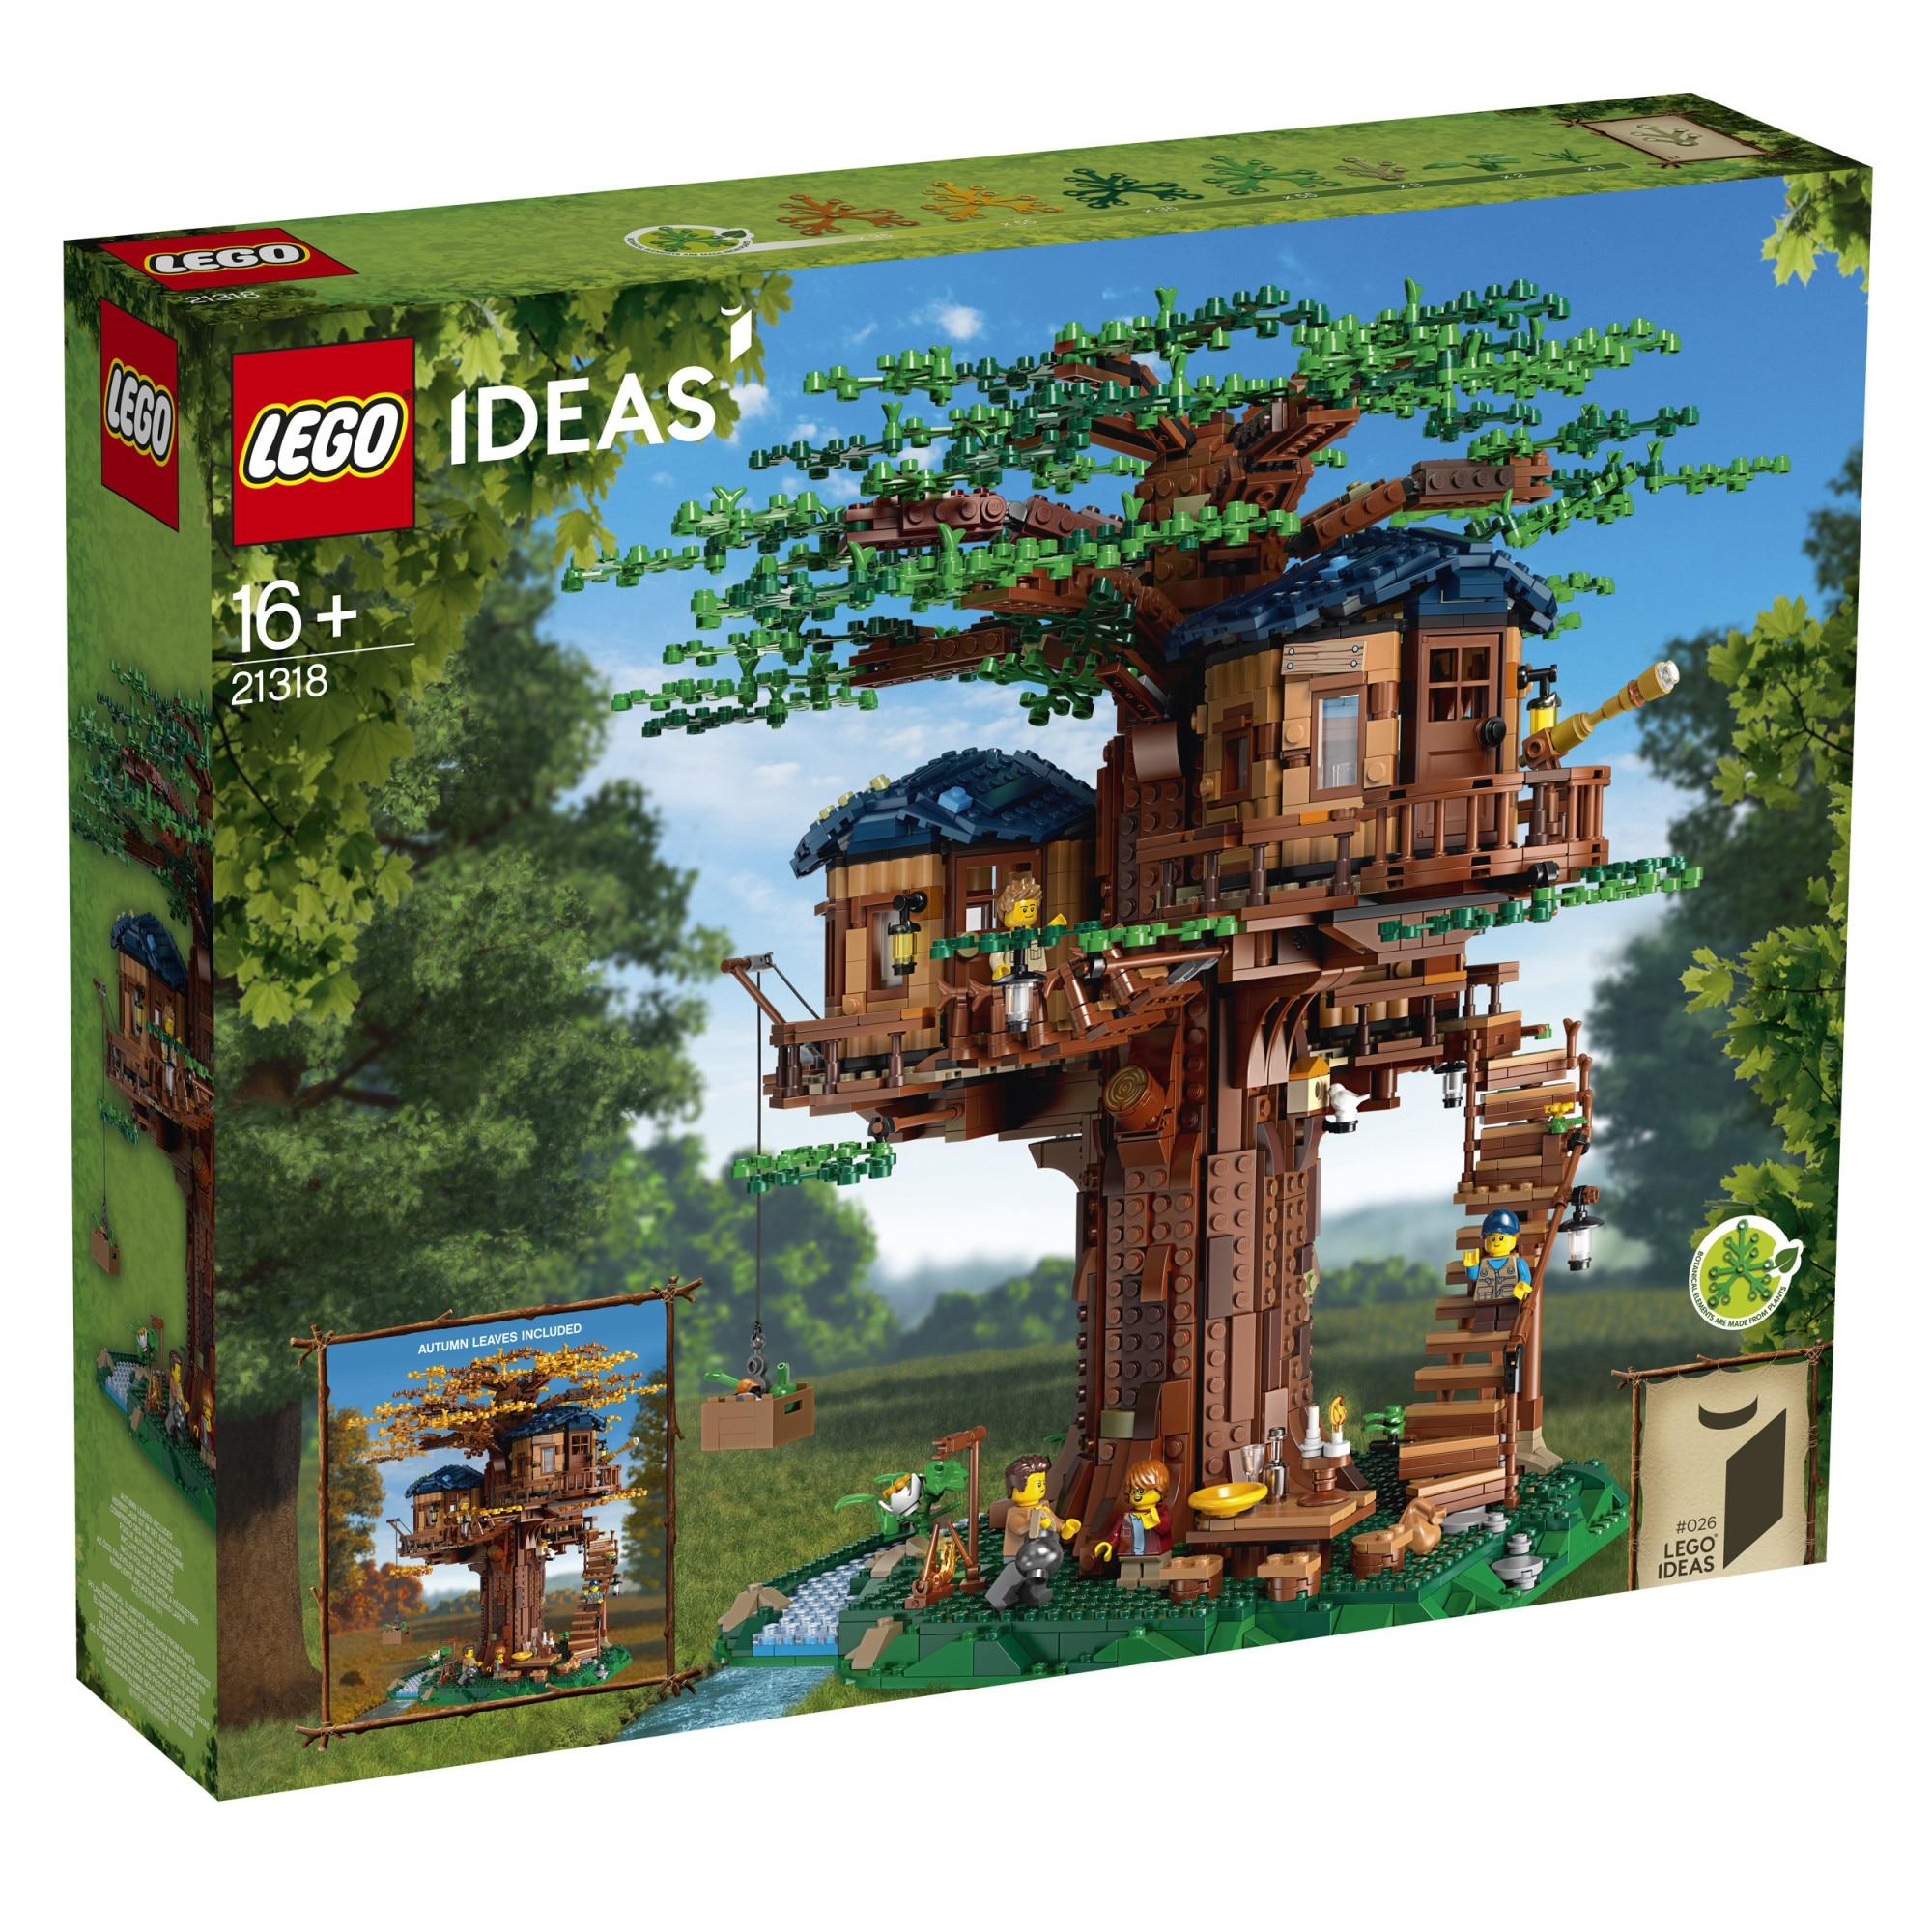 Fotografie LEGO Ideas - Tree House 21318, 3036 piese